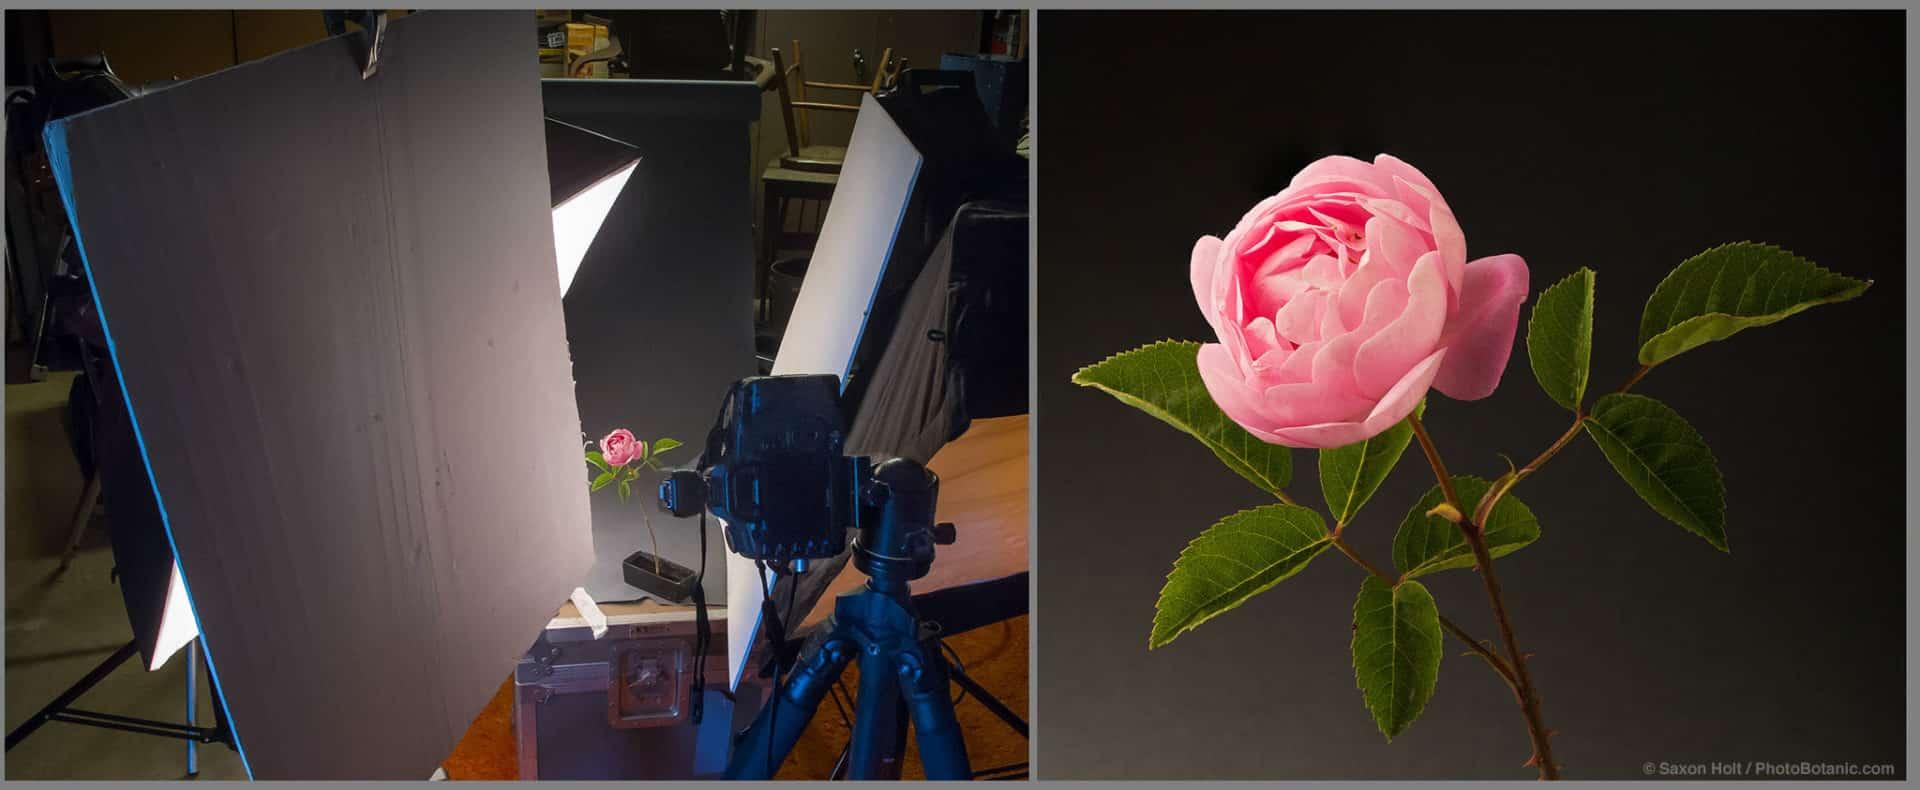 Saxon Holt's garage studio photographing old roses